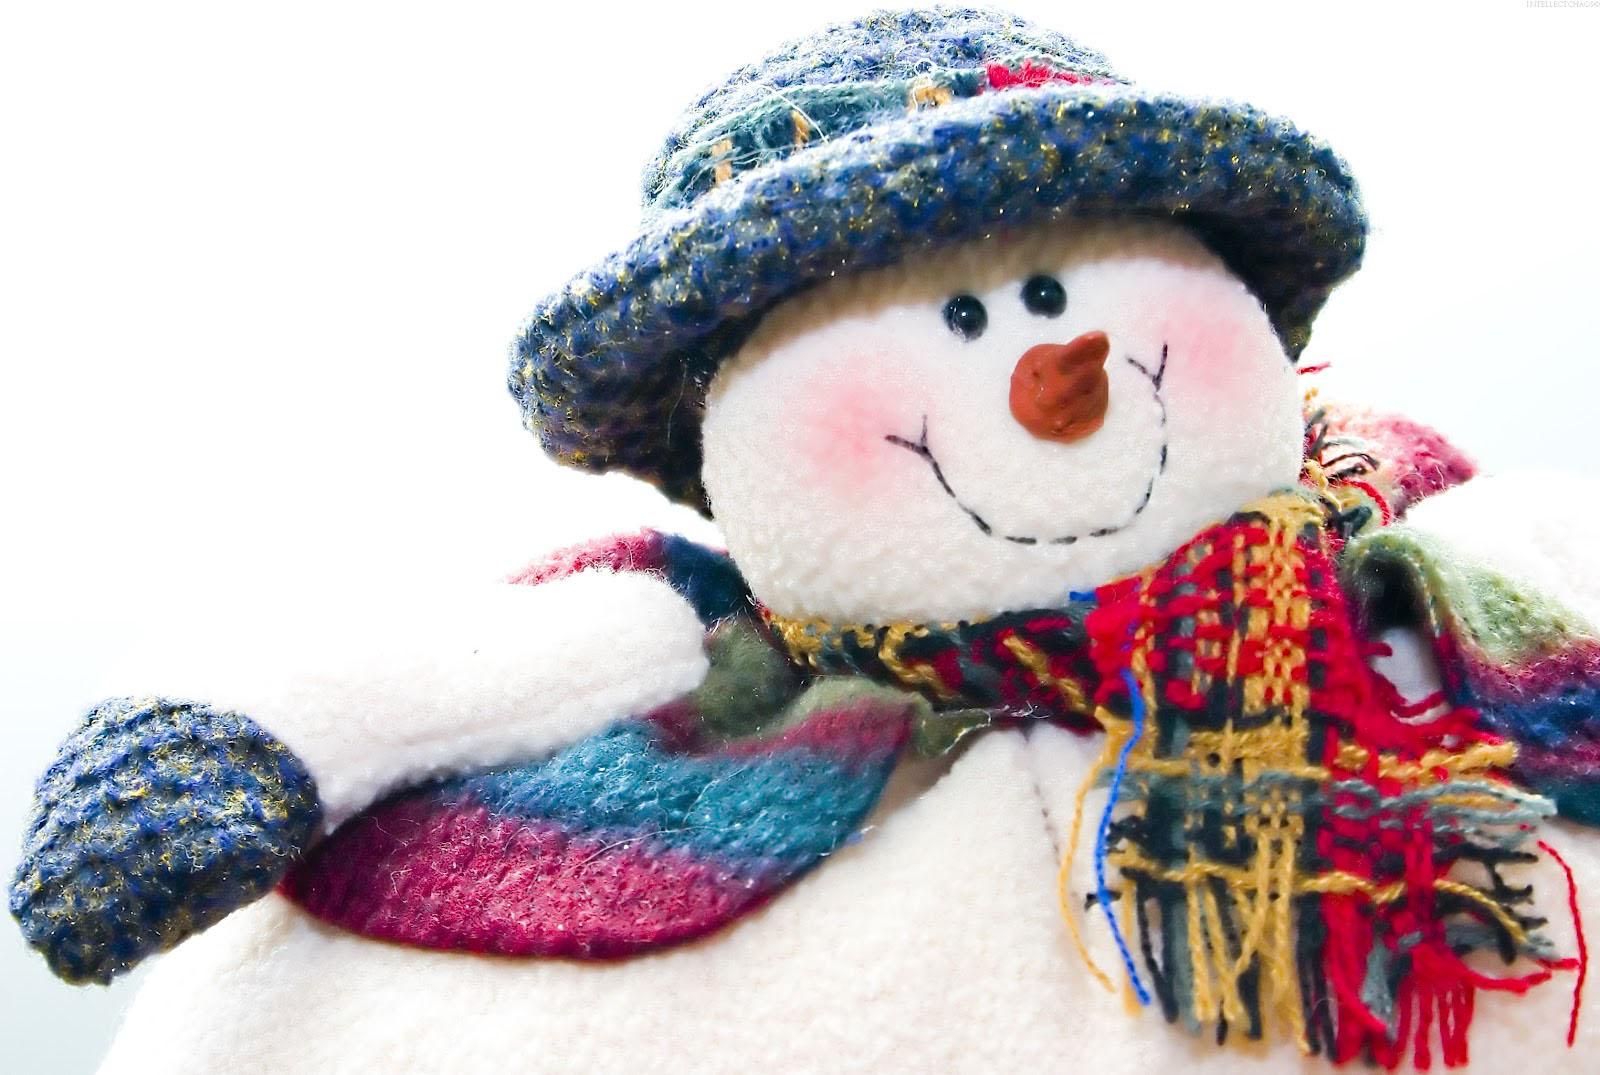 Christmas Snow Man HD Wallpaper